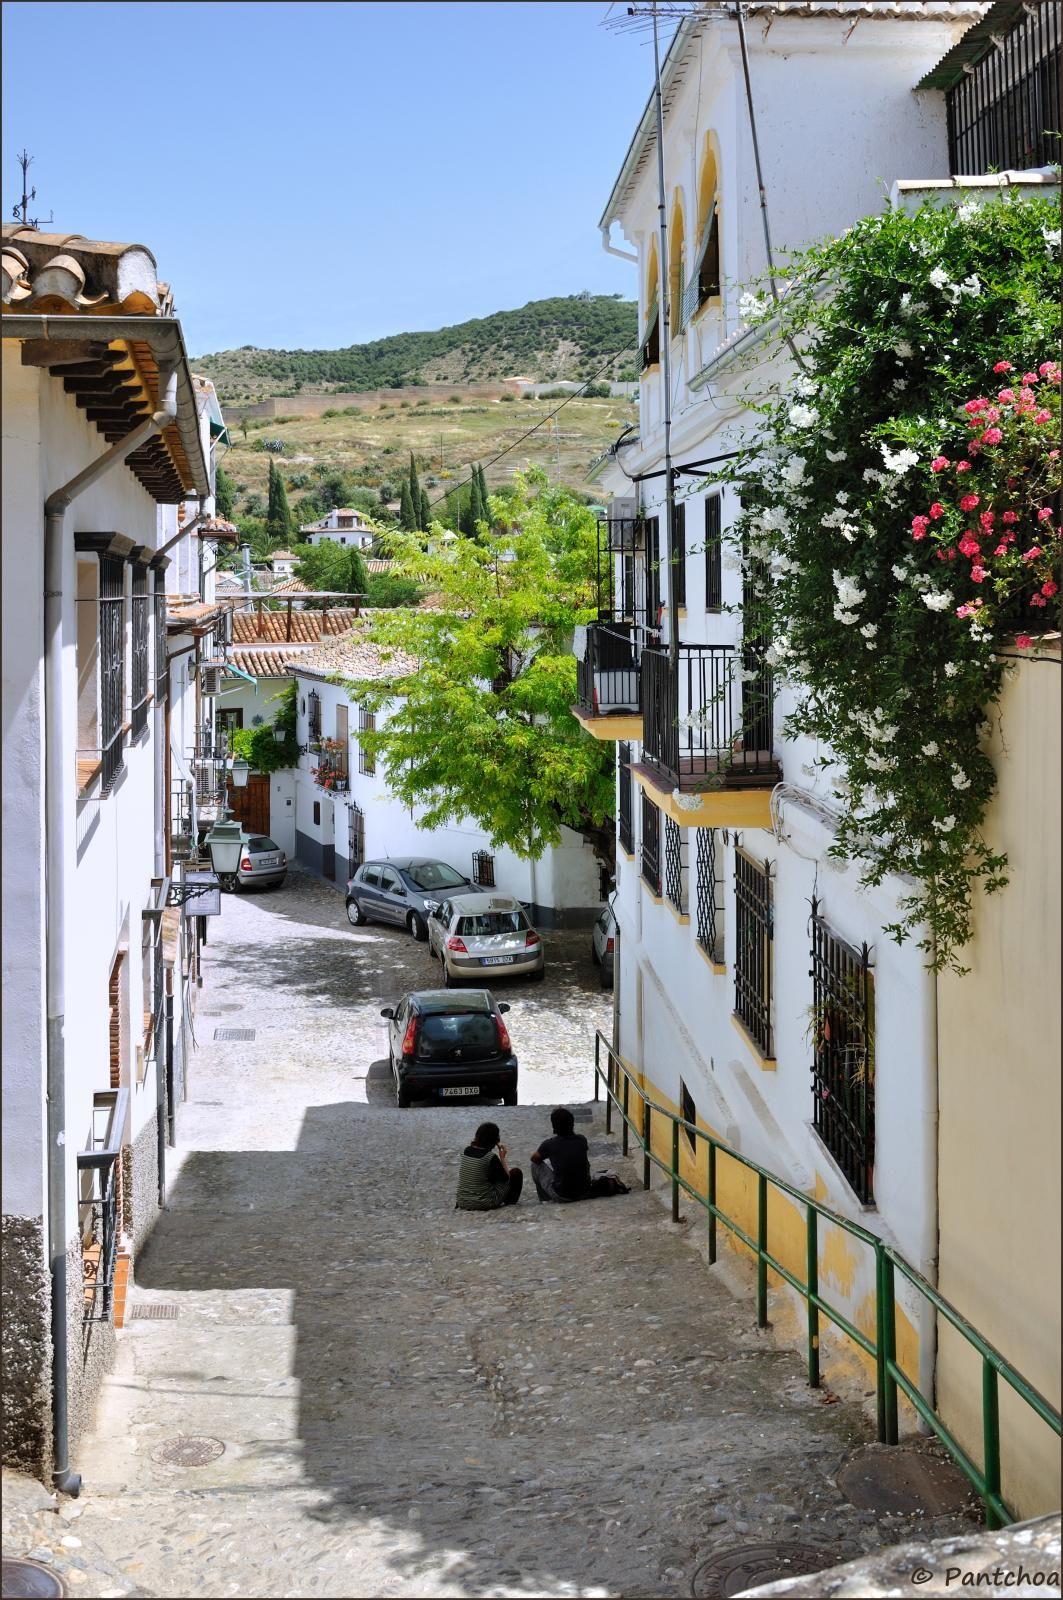 Street in El Albayzín (also Albaicín or El Albaicín) is a district of Granada, in the autonomous community of Andalusia_ Spain